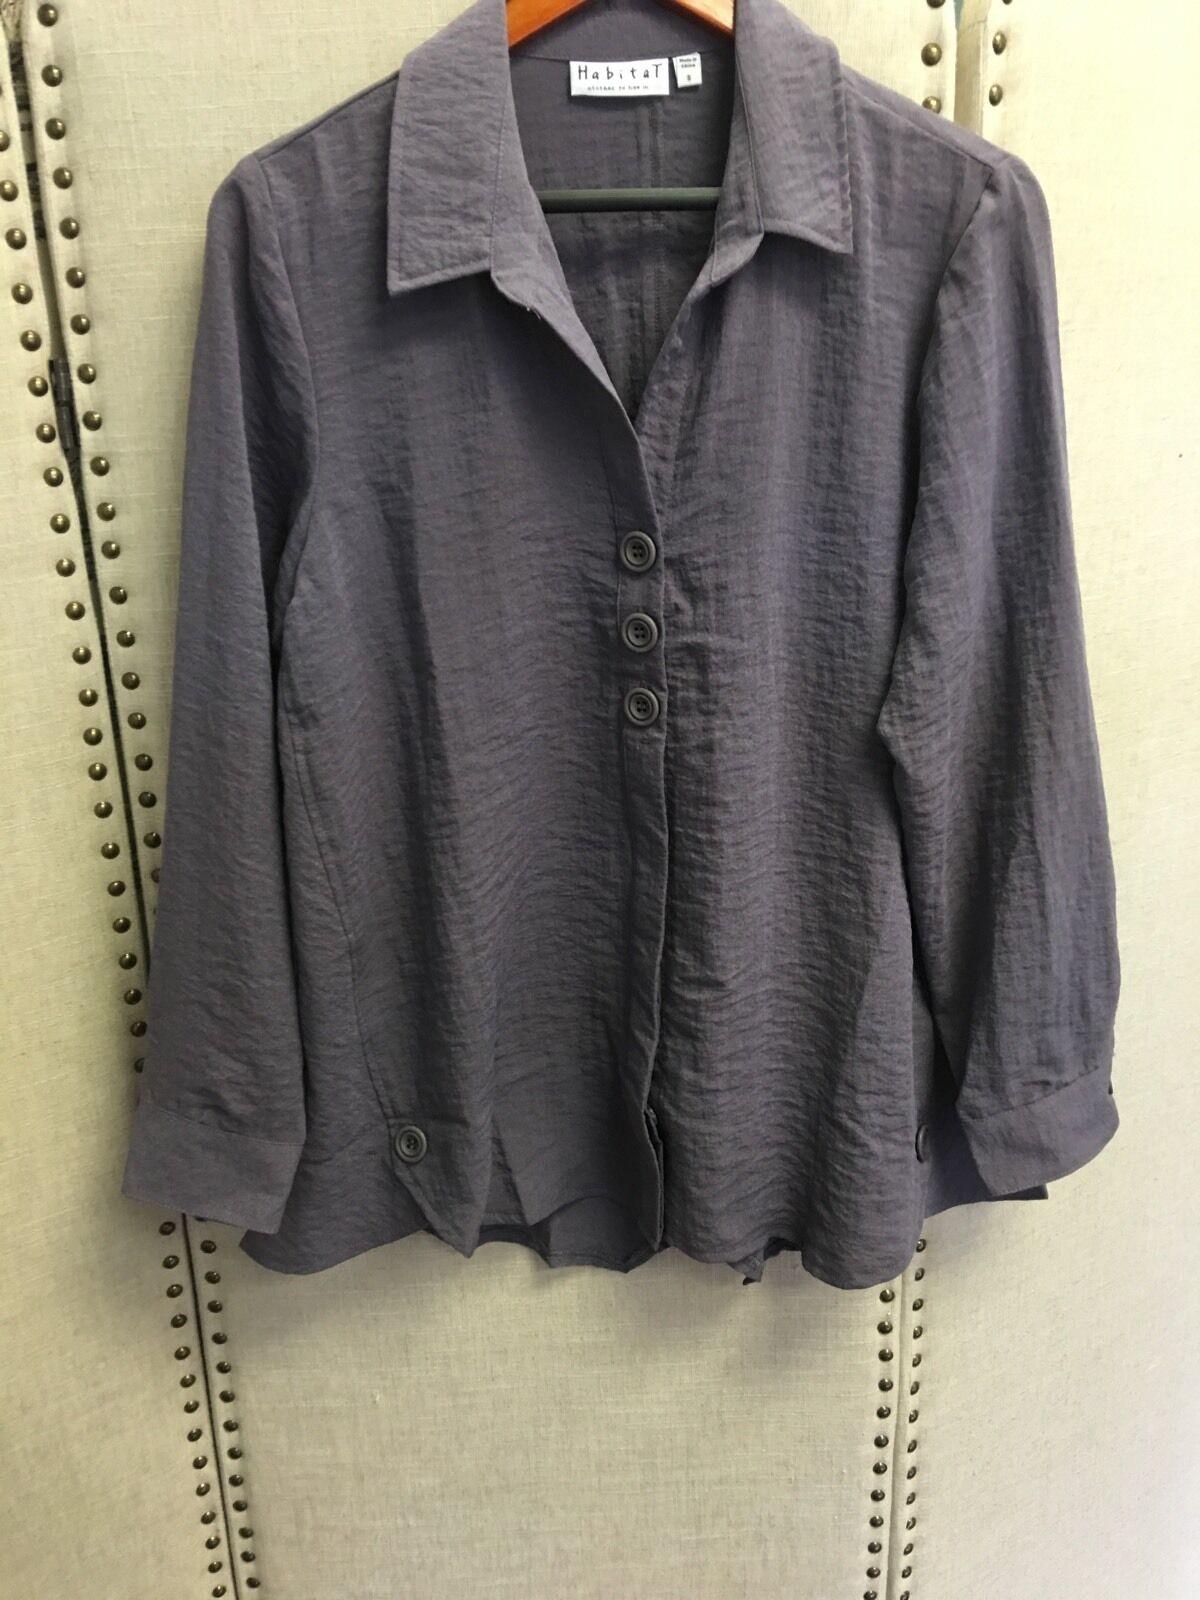 Habitat Cement shirt jacket.NWT .Größe S.